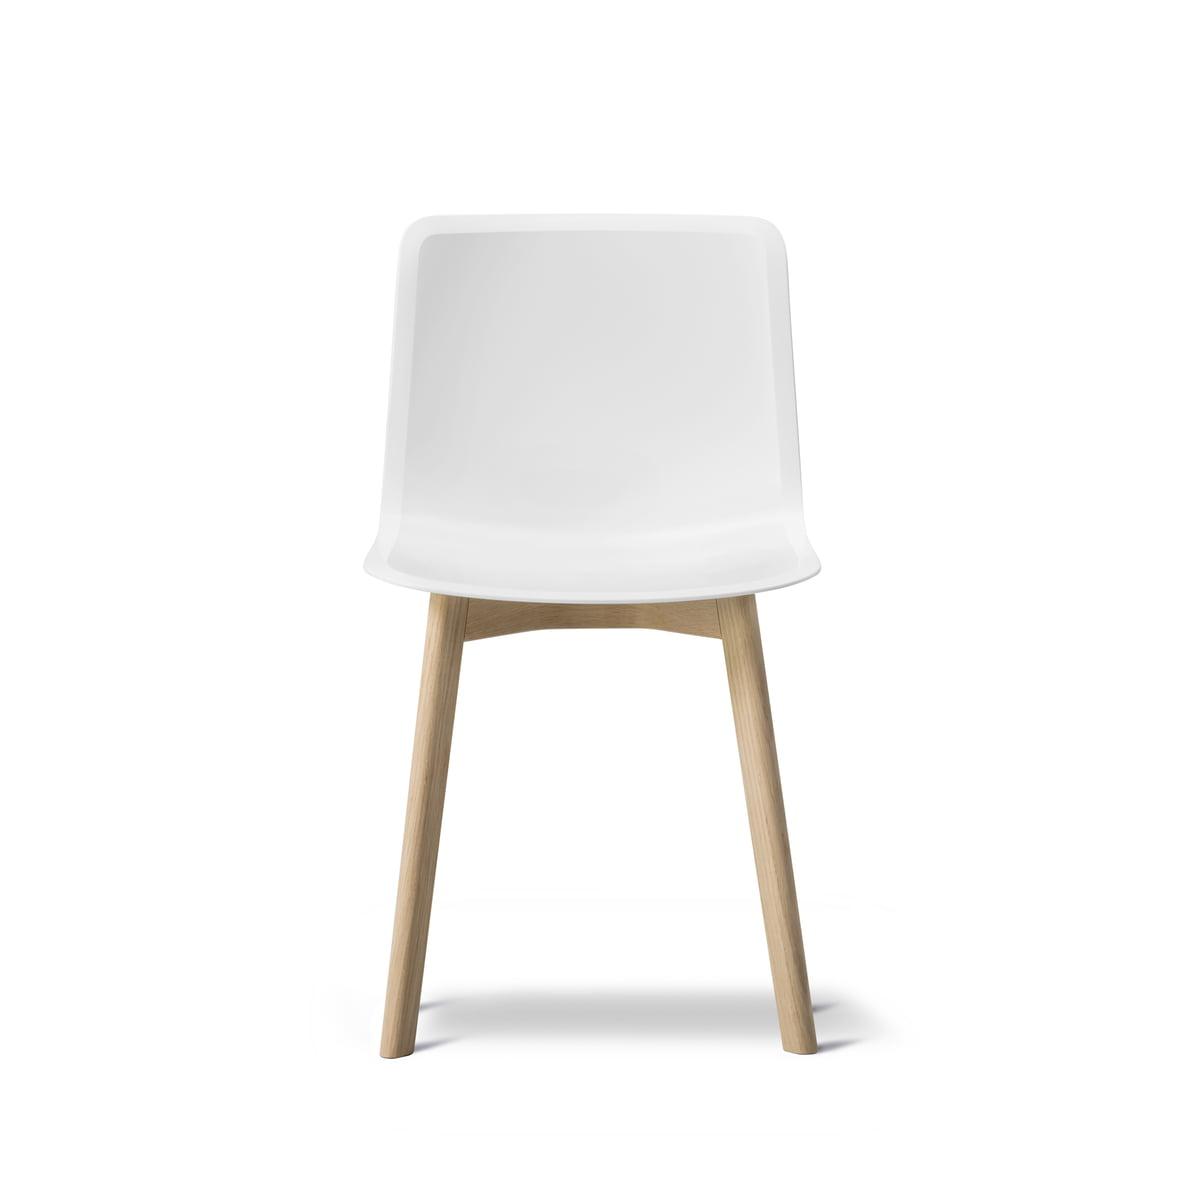 pato wood base stuhl von fredericia connox. Black Bedroom Furniture Sets. Home Design Ideas